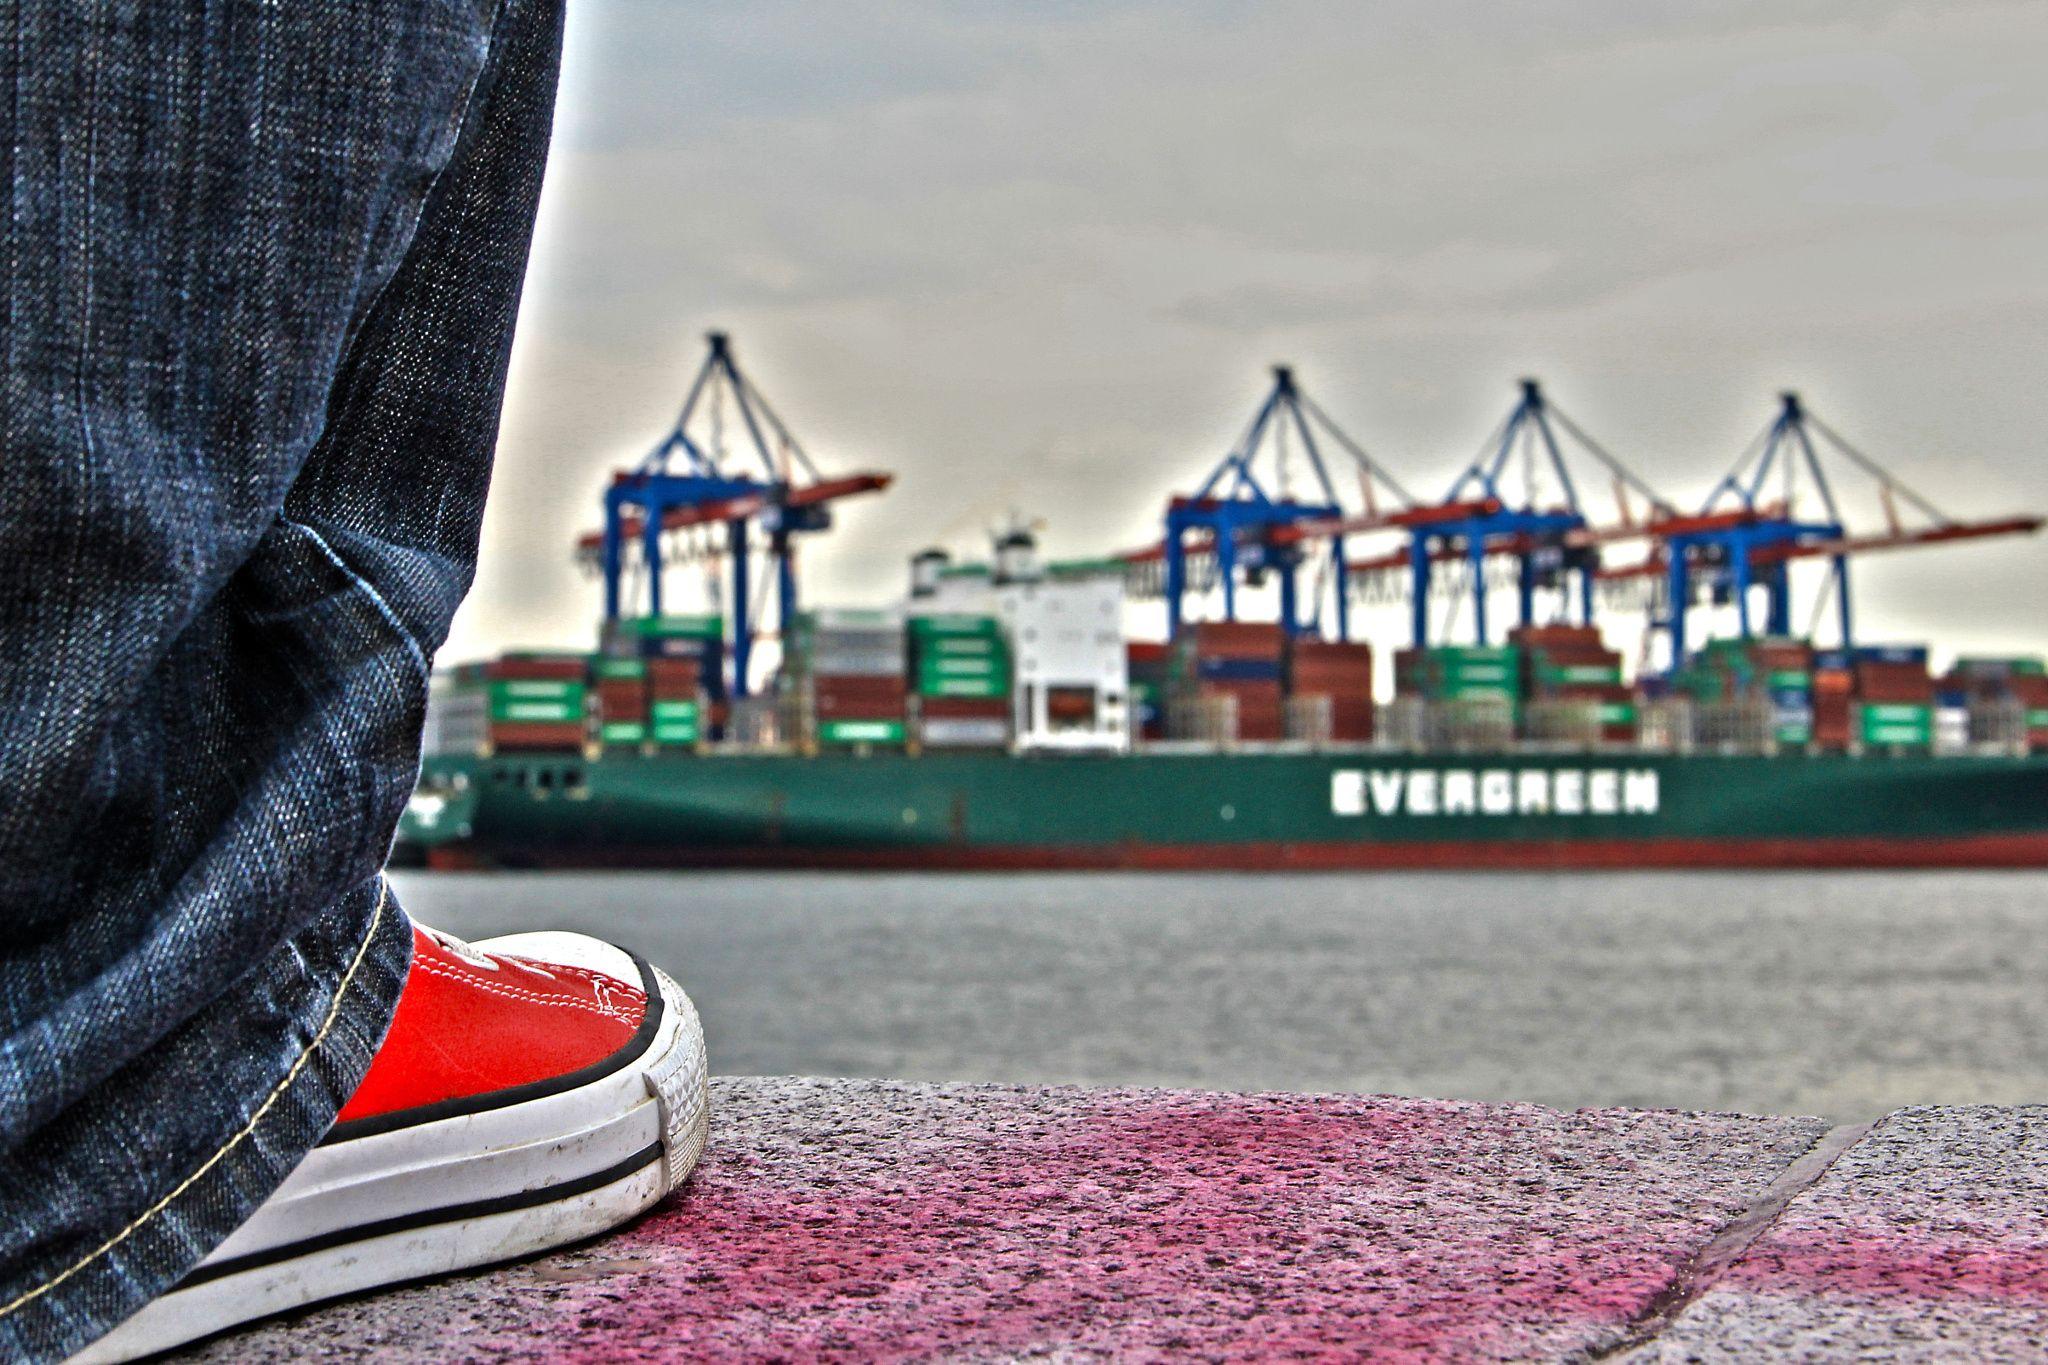 Evergreen Bleeding Chucks by Michael Schloz on 500px.                                     #chucks #evergreen #elbstrand #hamburg #citytrip #citytriphamburg #shoe #containerterminal #containership #ship #wall #hamburgbyday #port #portofhamburg